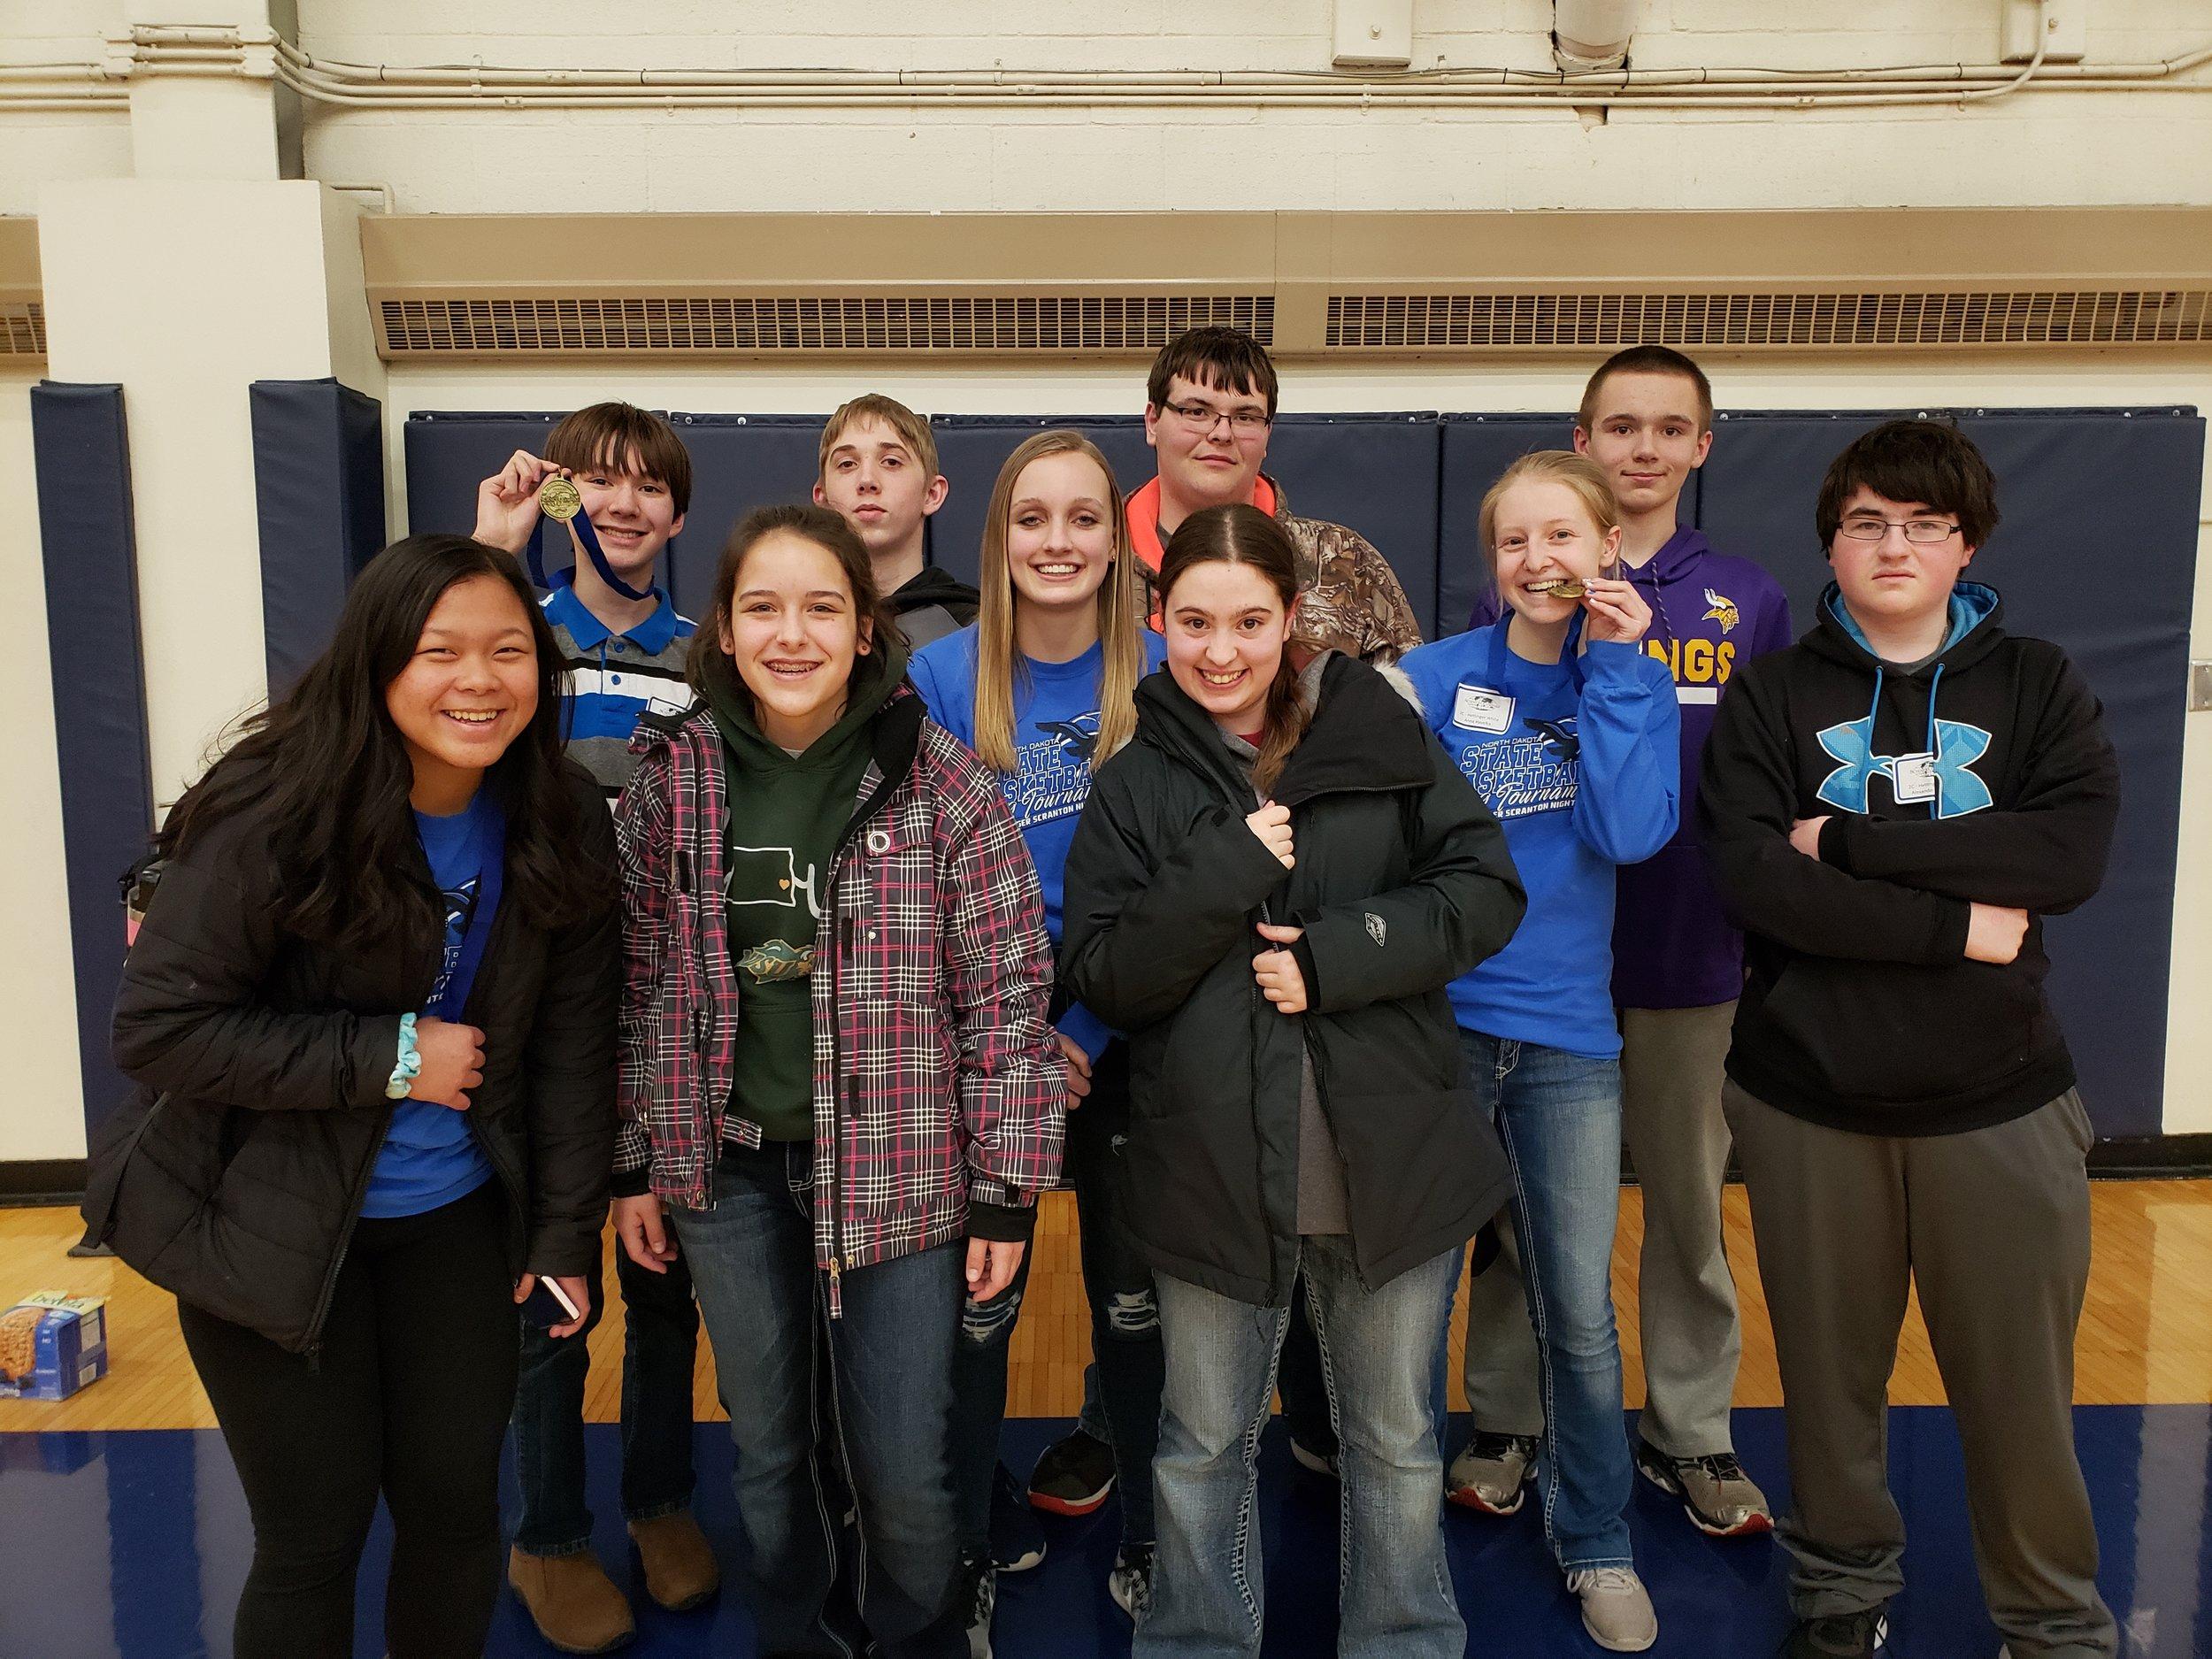 Freshmen Science O Team - State Bound 2019